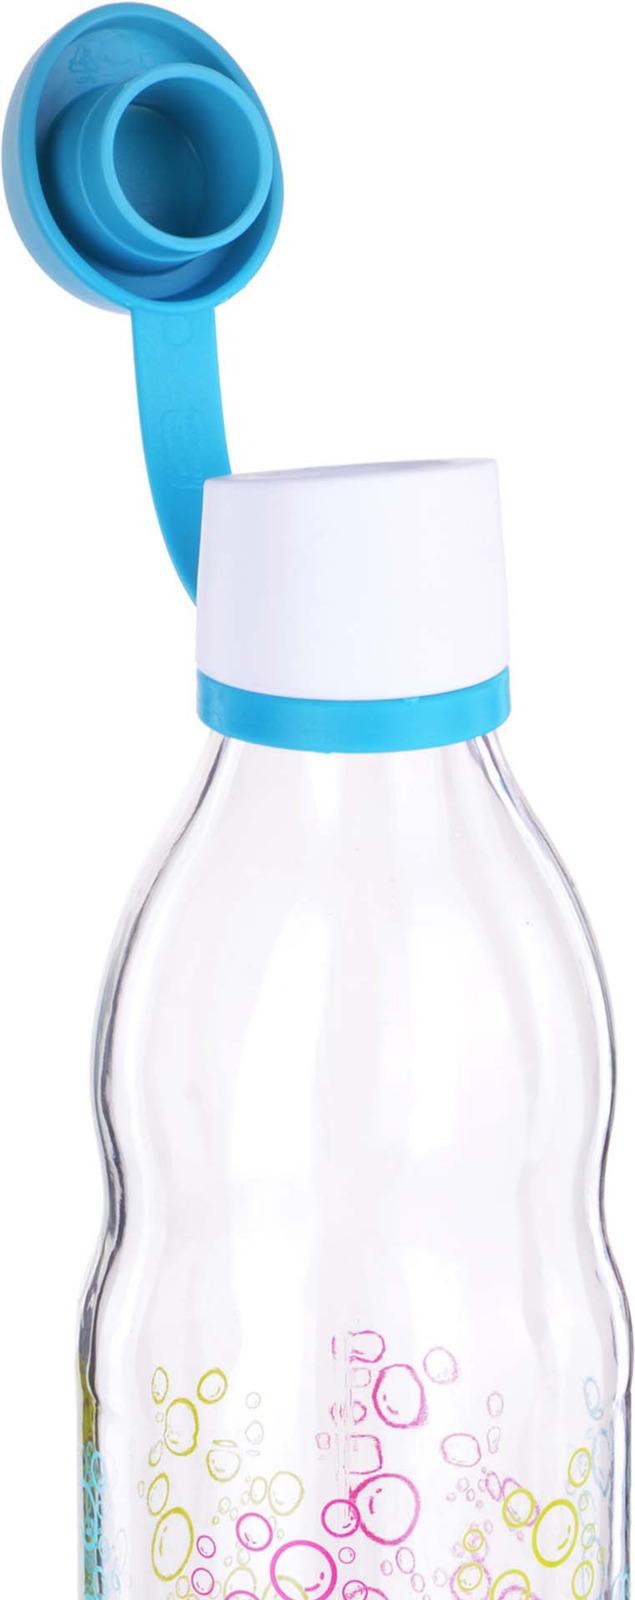 Бутылка Mayer & Boch, цвет: голубой, 0,5 л